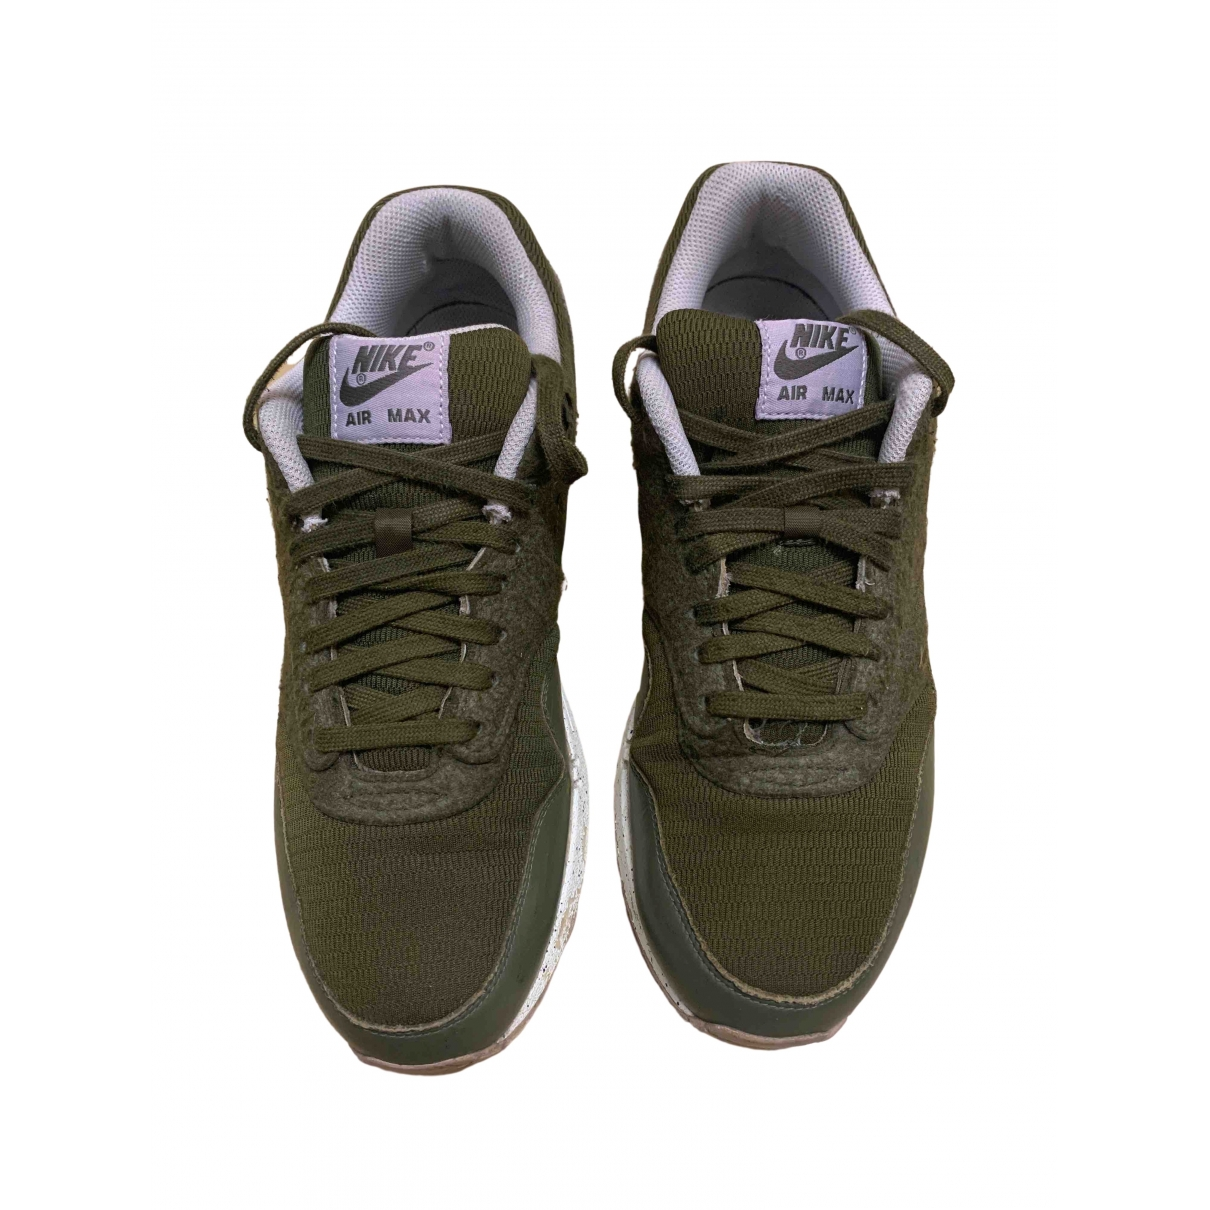 Nike Air Max 1 Green Cloth Trainers for Men 44 EU